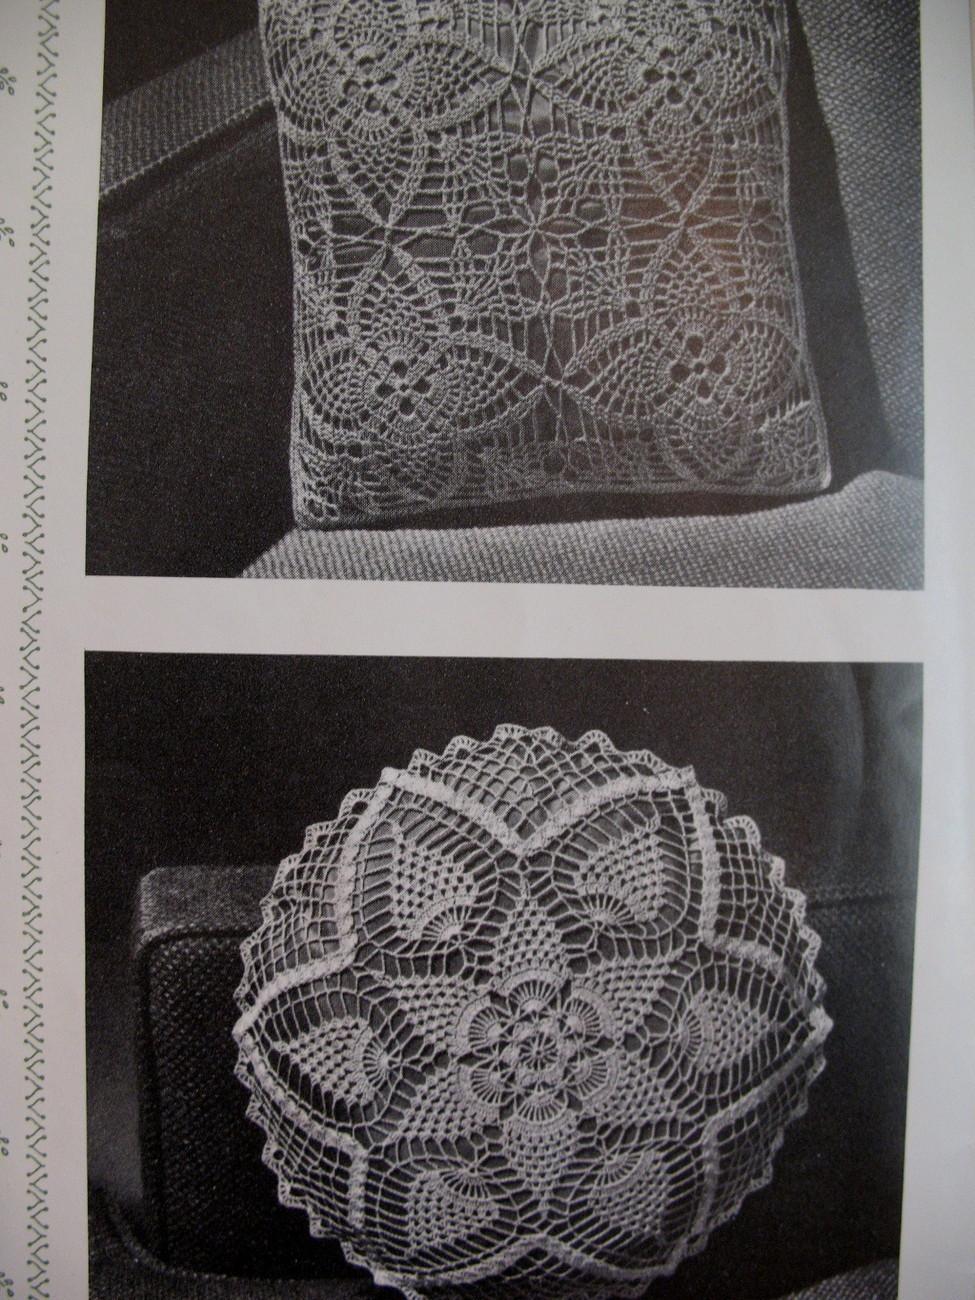 Vintage Pineapple Designs Crochet Pattern Booklet